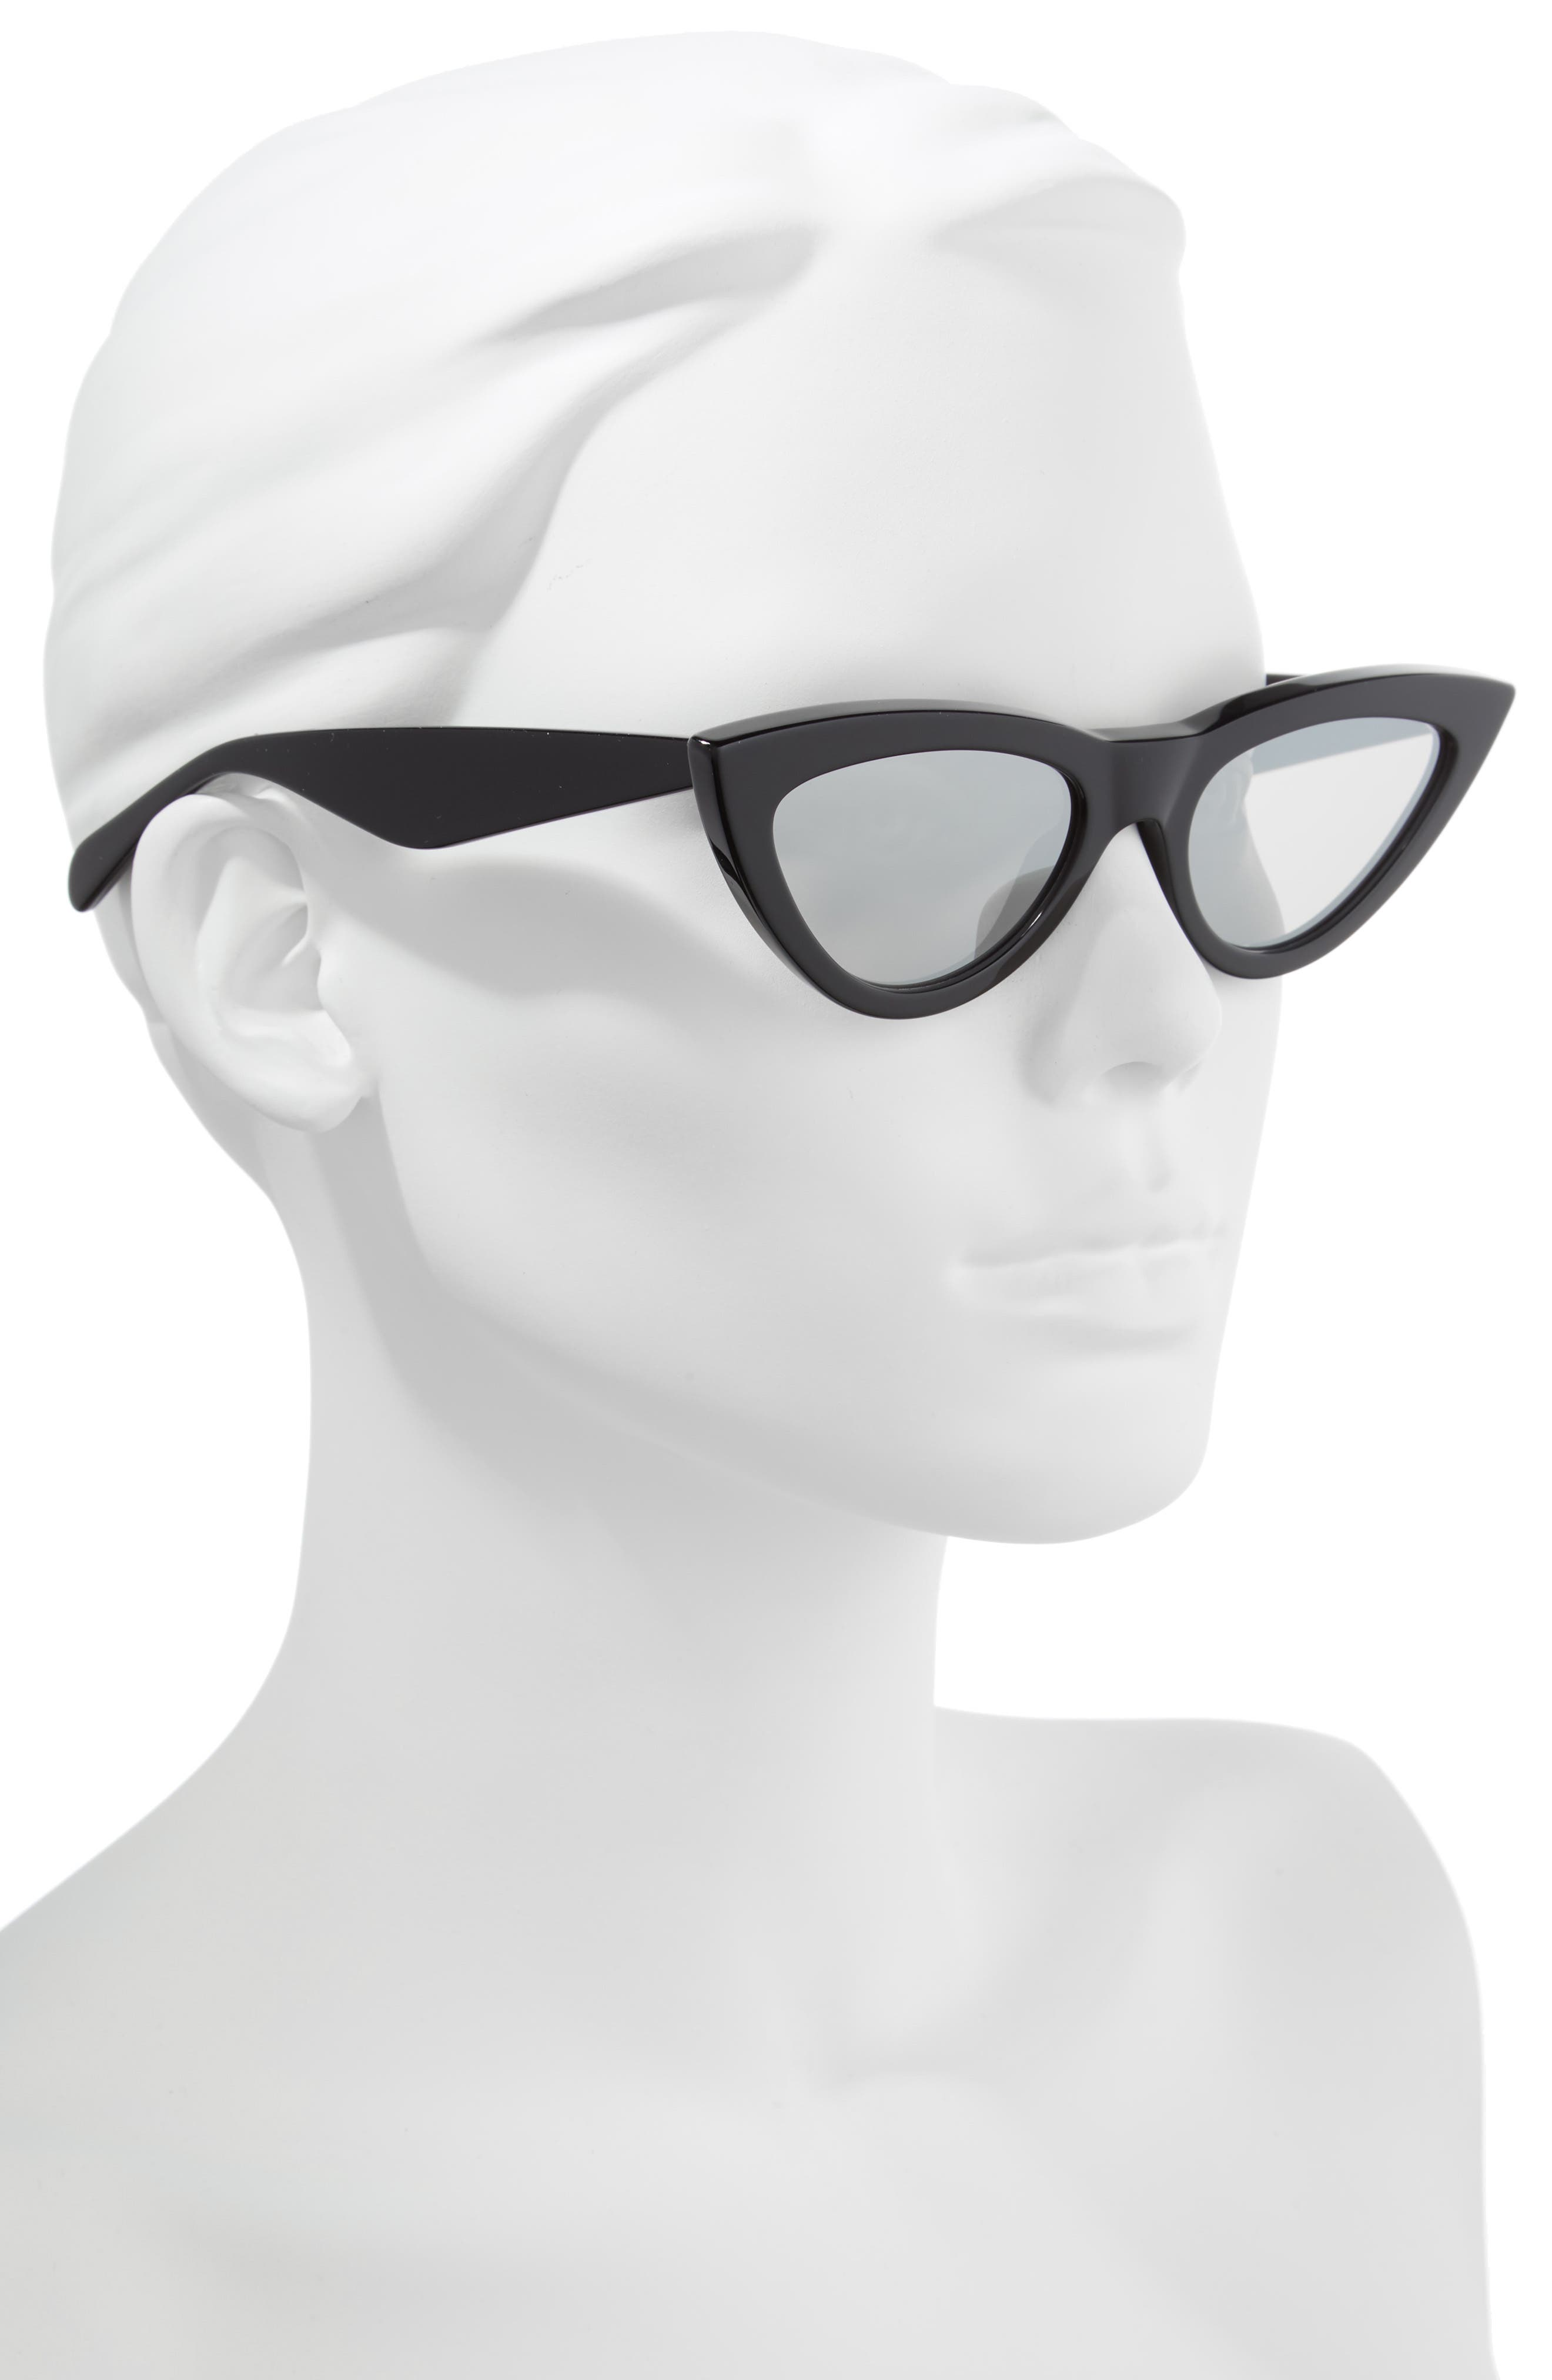 56mm Cat Eye Sunglasses,                             Alternate thumbnail 2, color,                             BLACK/ SILVER FLASH